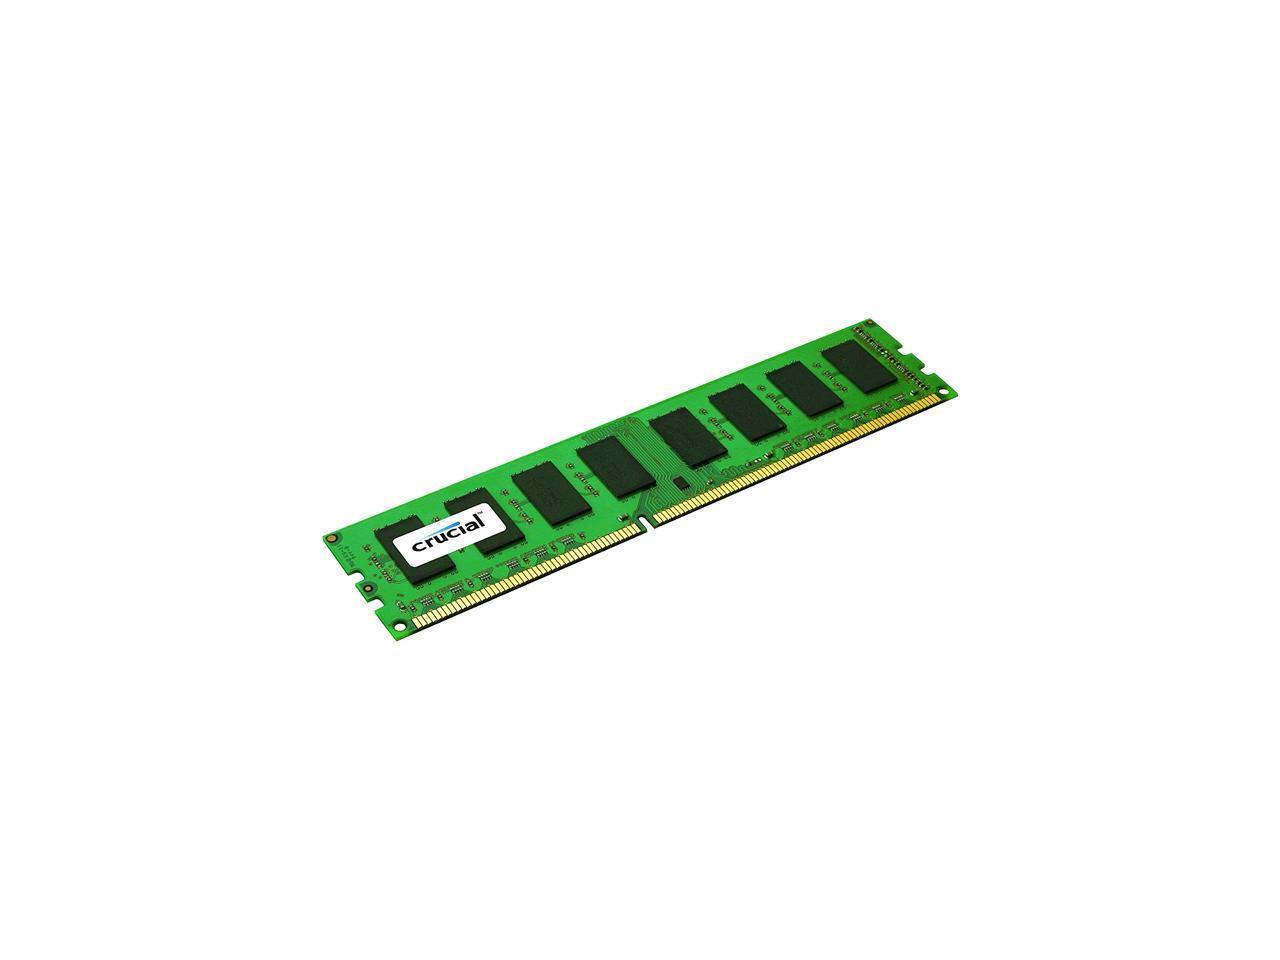 Crucial 8GB 21-1600 memory module 1 x 8 GB 1600 MHz ECC